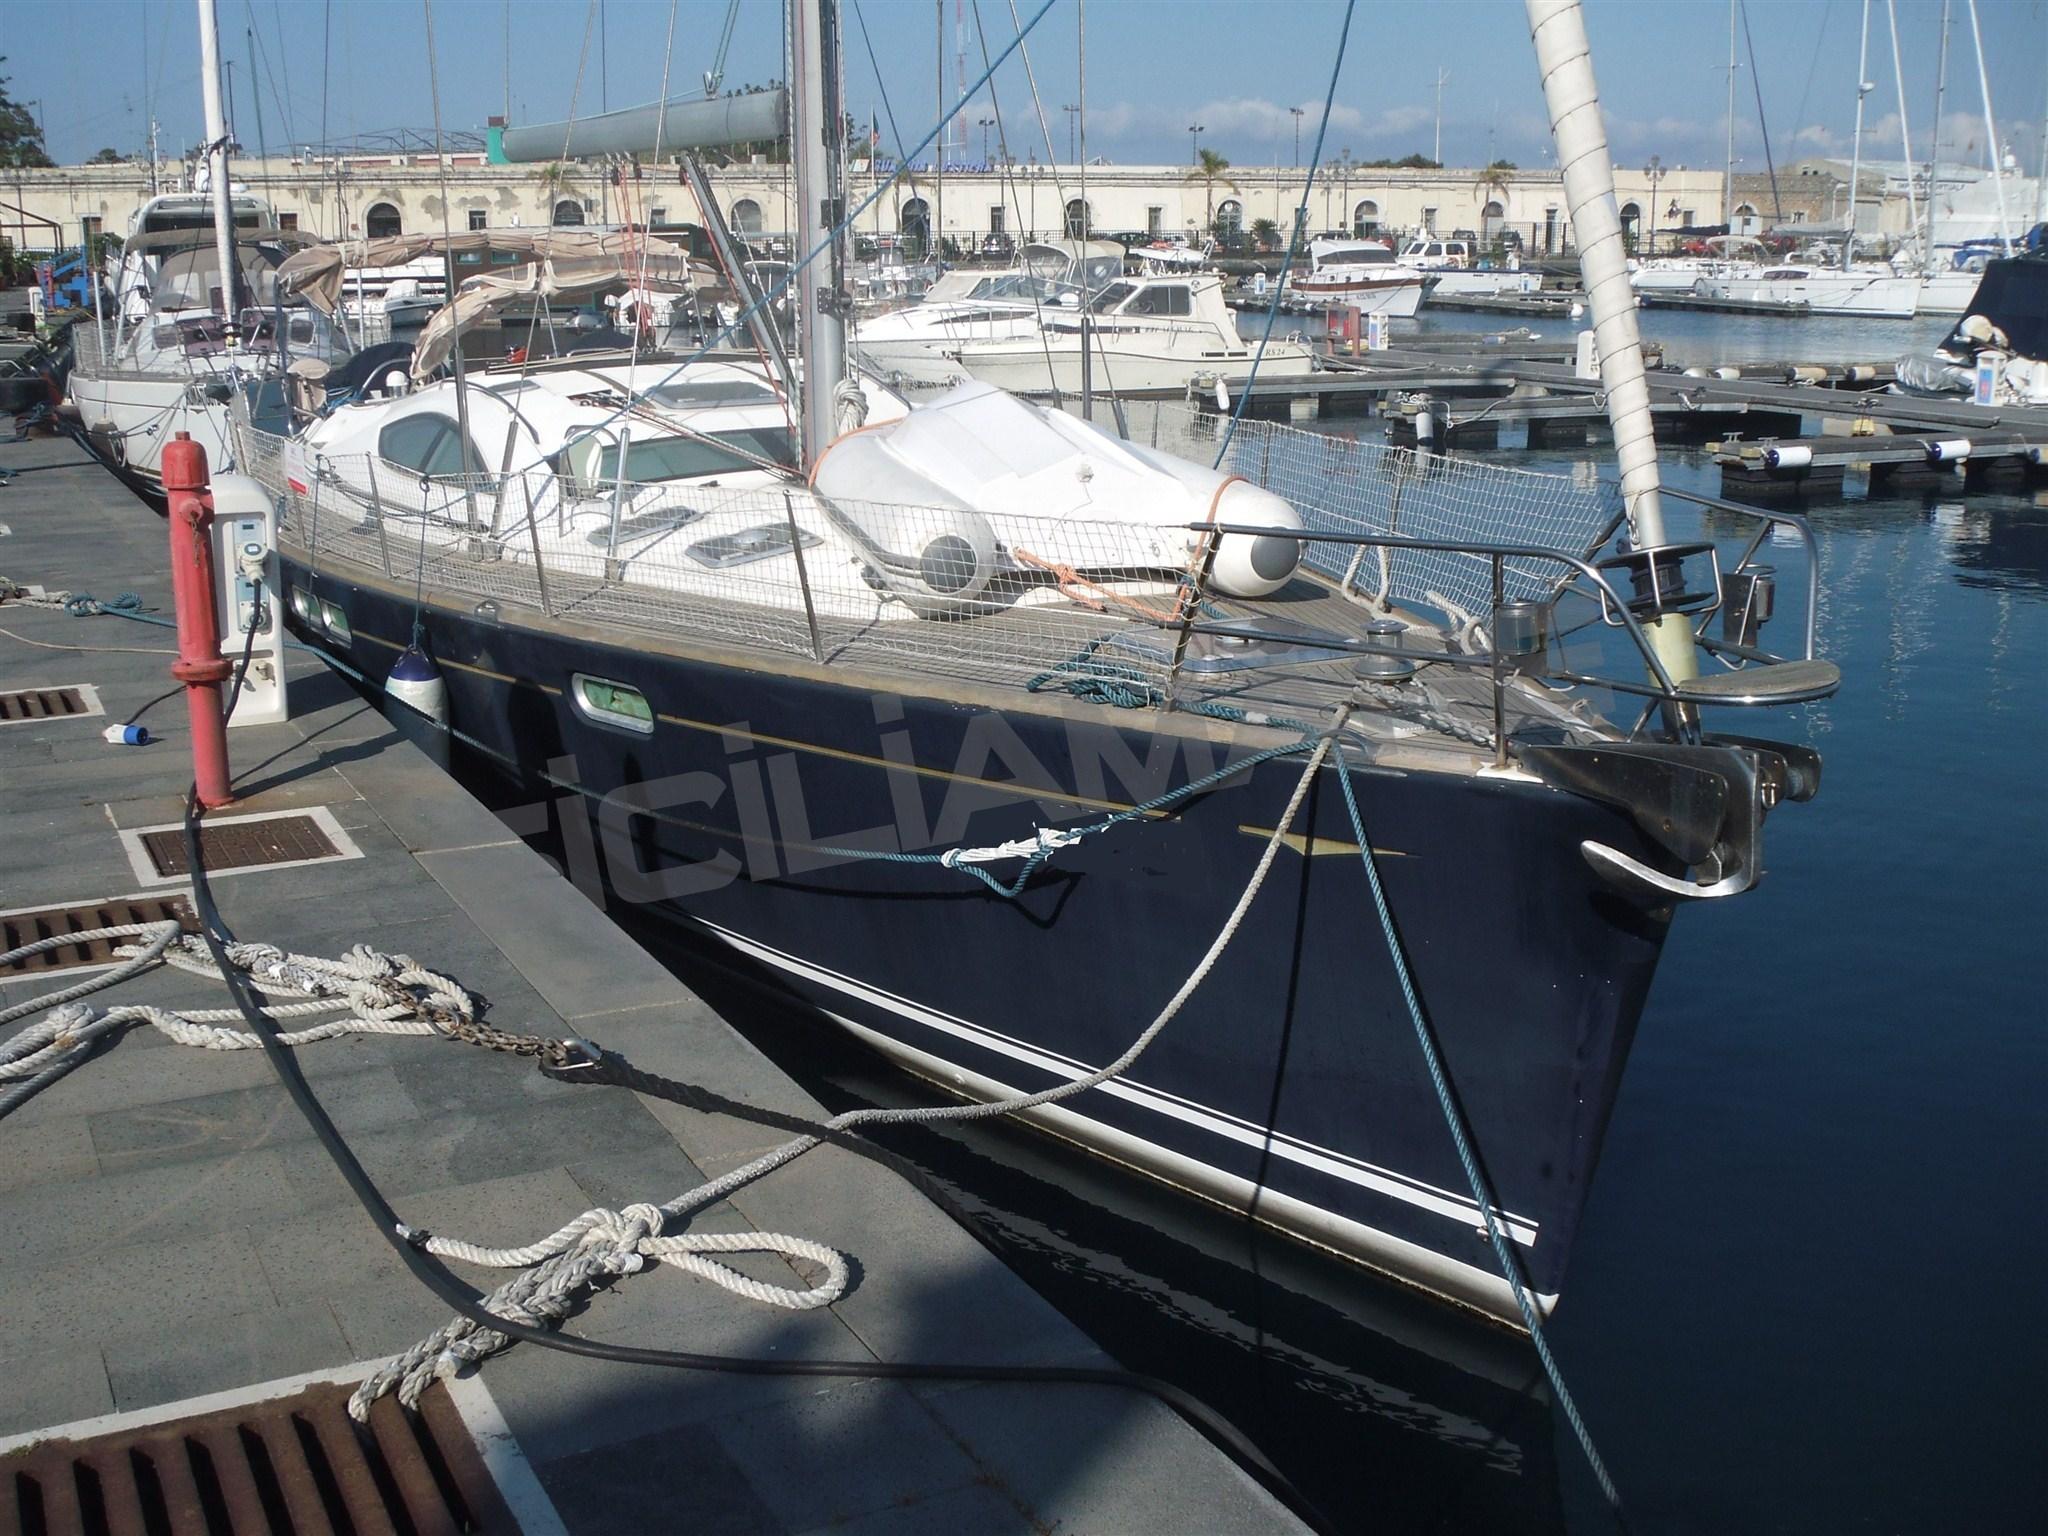 Jeanneau Sun Odyssey 54 Ds Preowned Sailboat For Sale In Sicilia